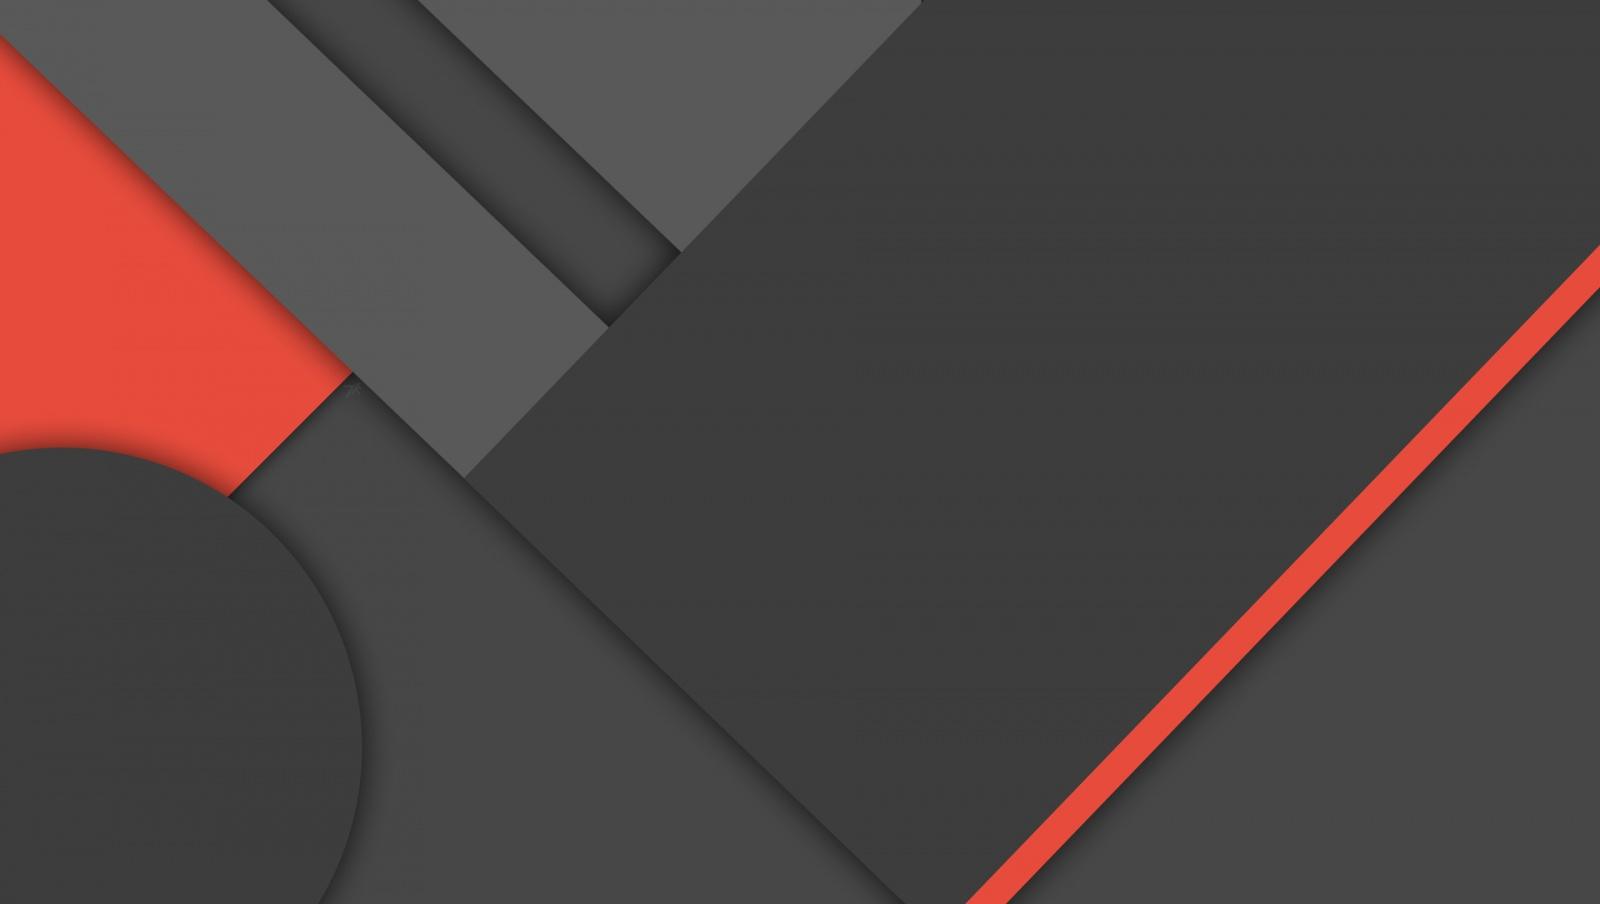 Material Design: философия и практика - 1